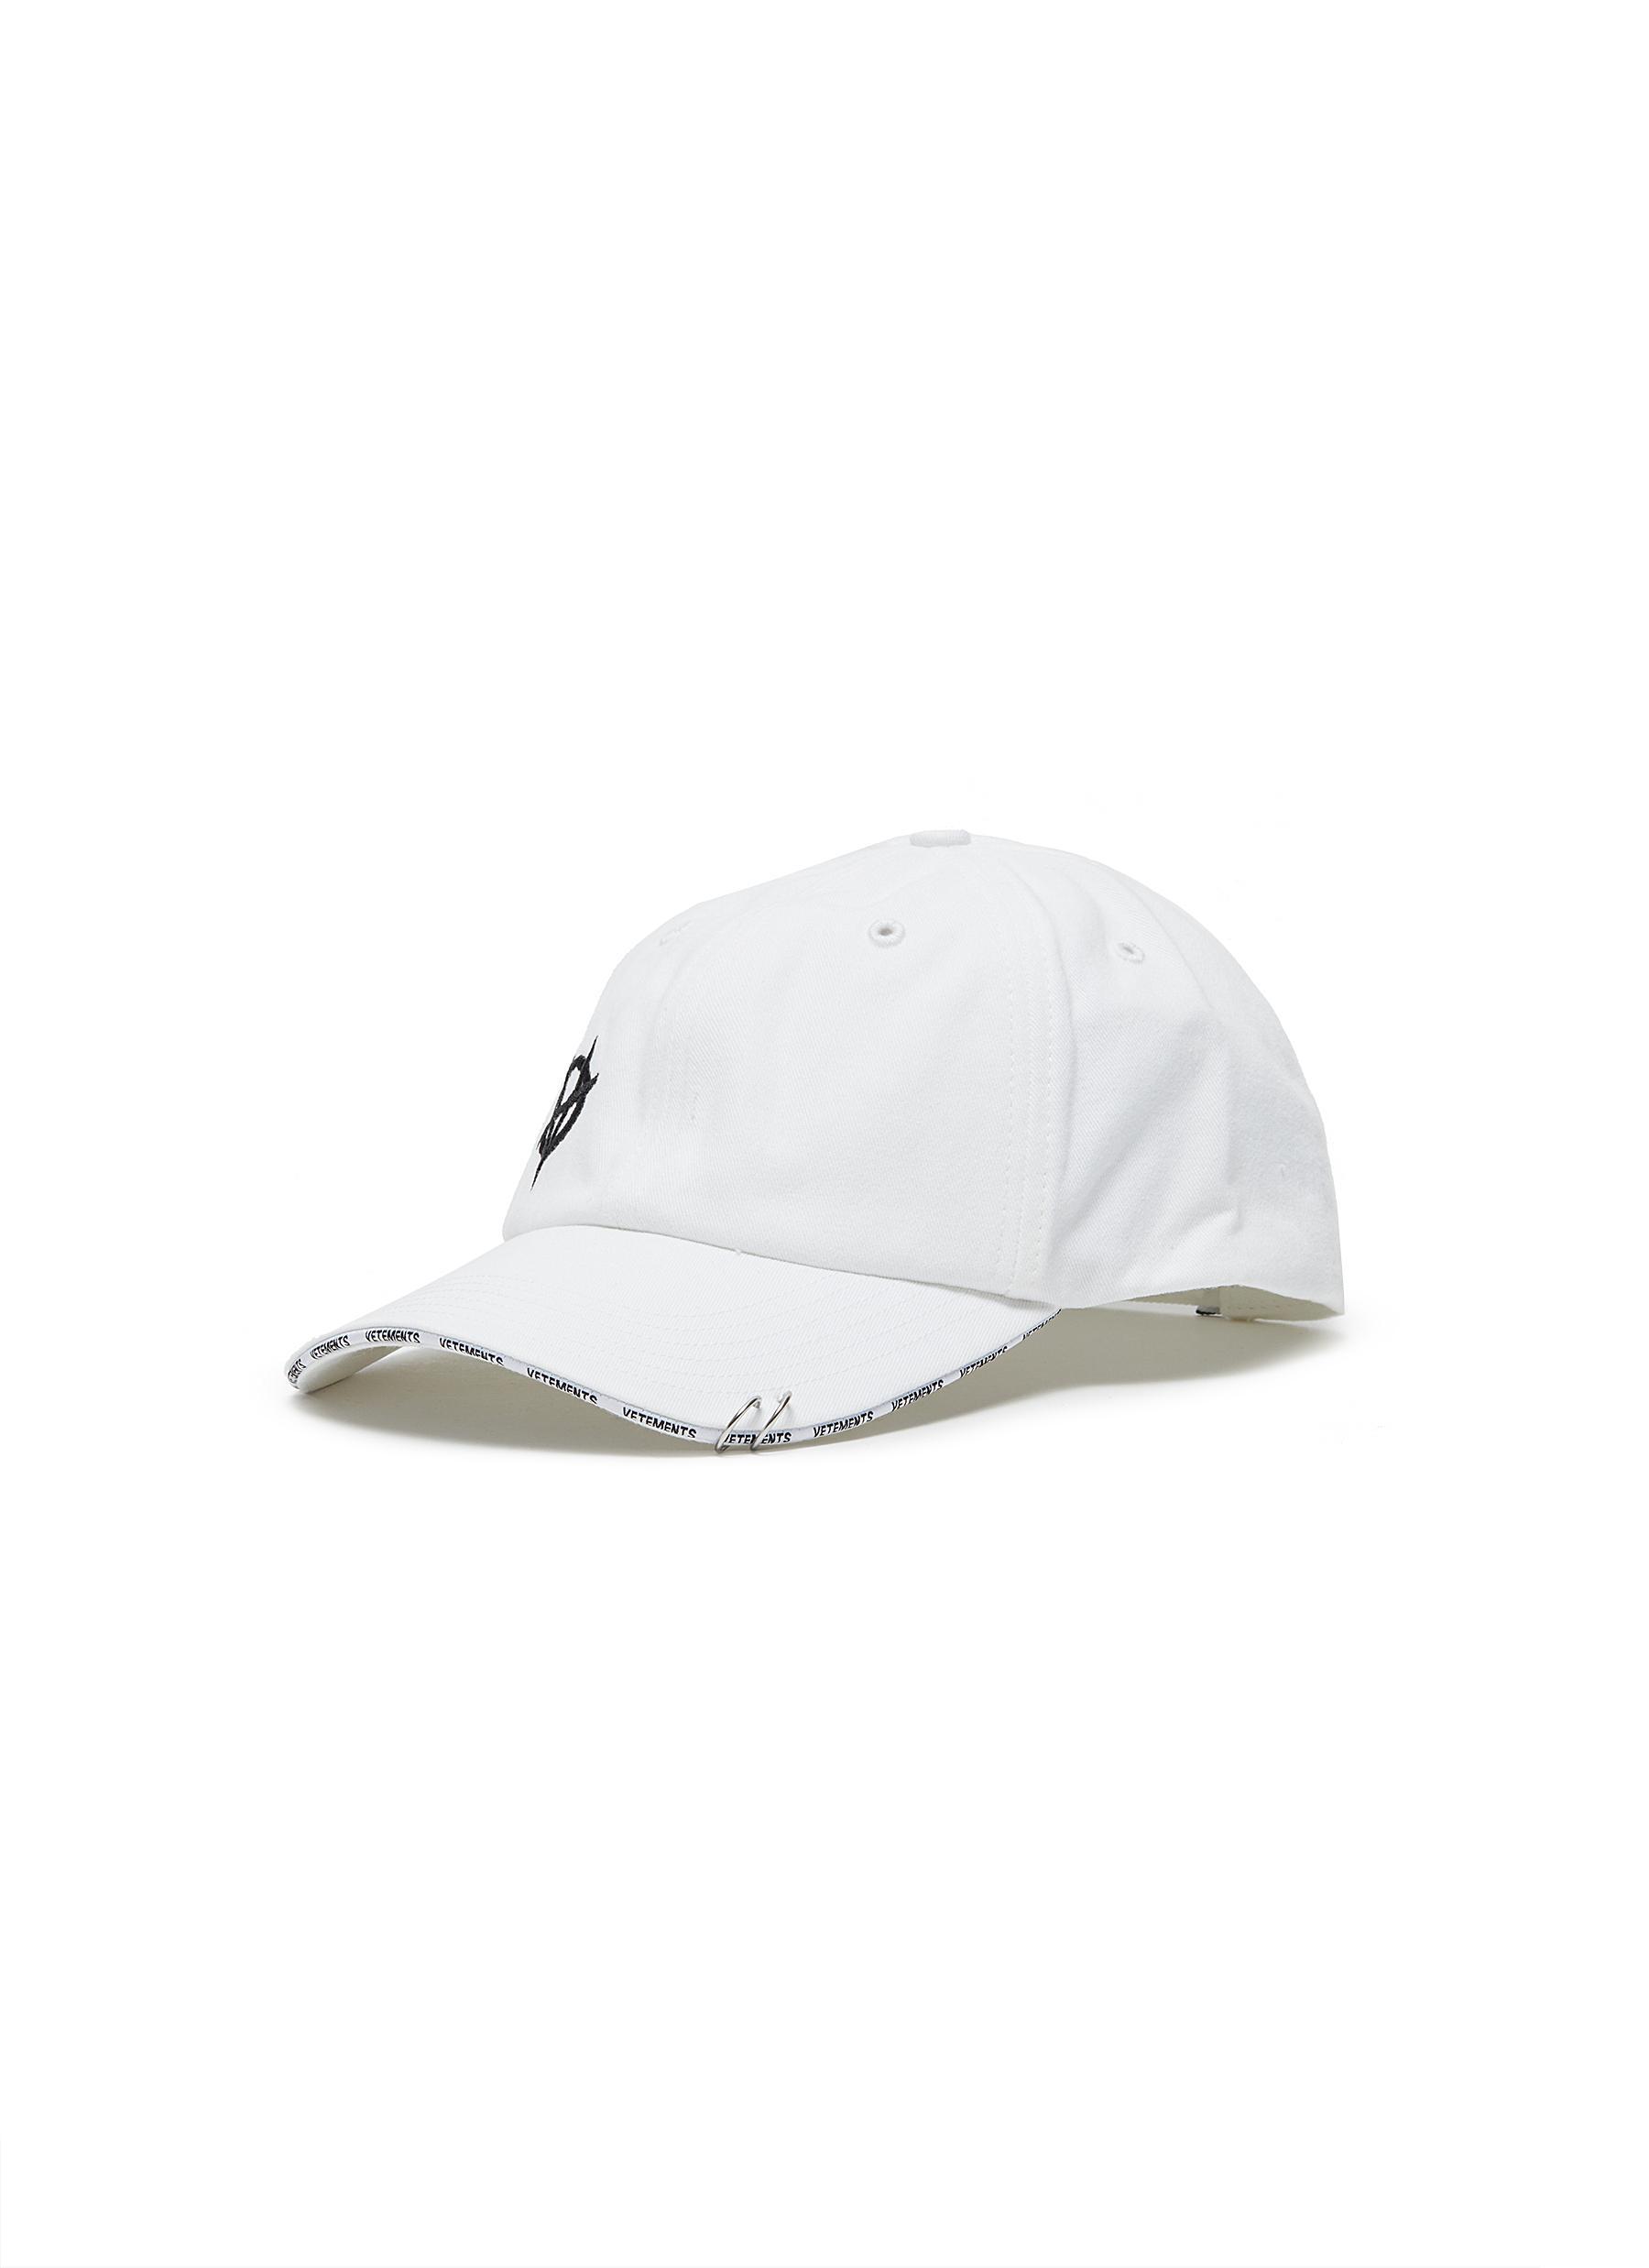 x Reebok 'Anarchy' logo embroidered baseball cap